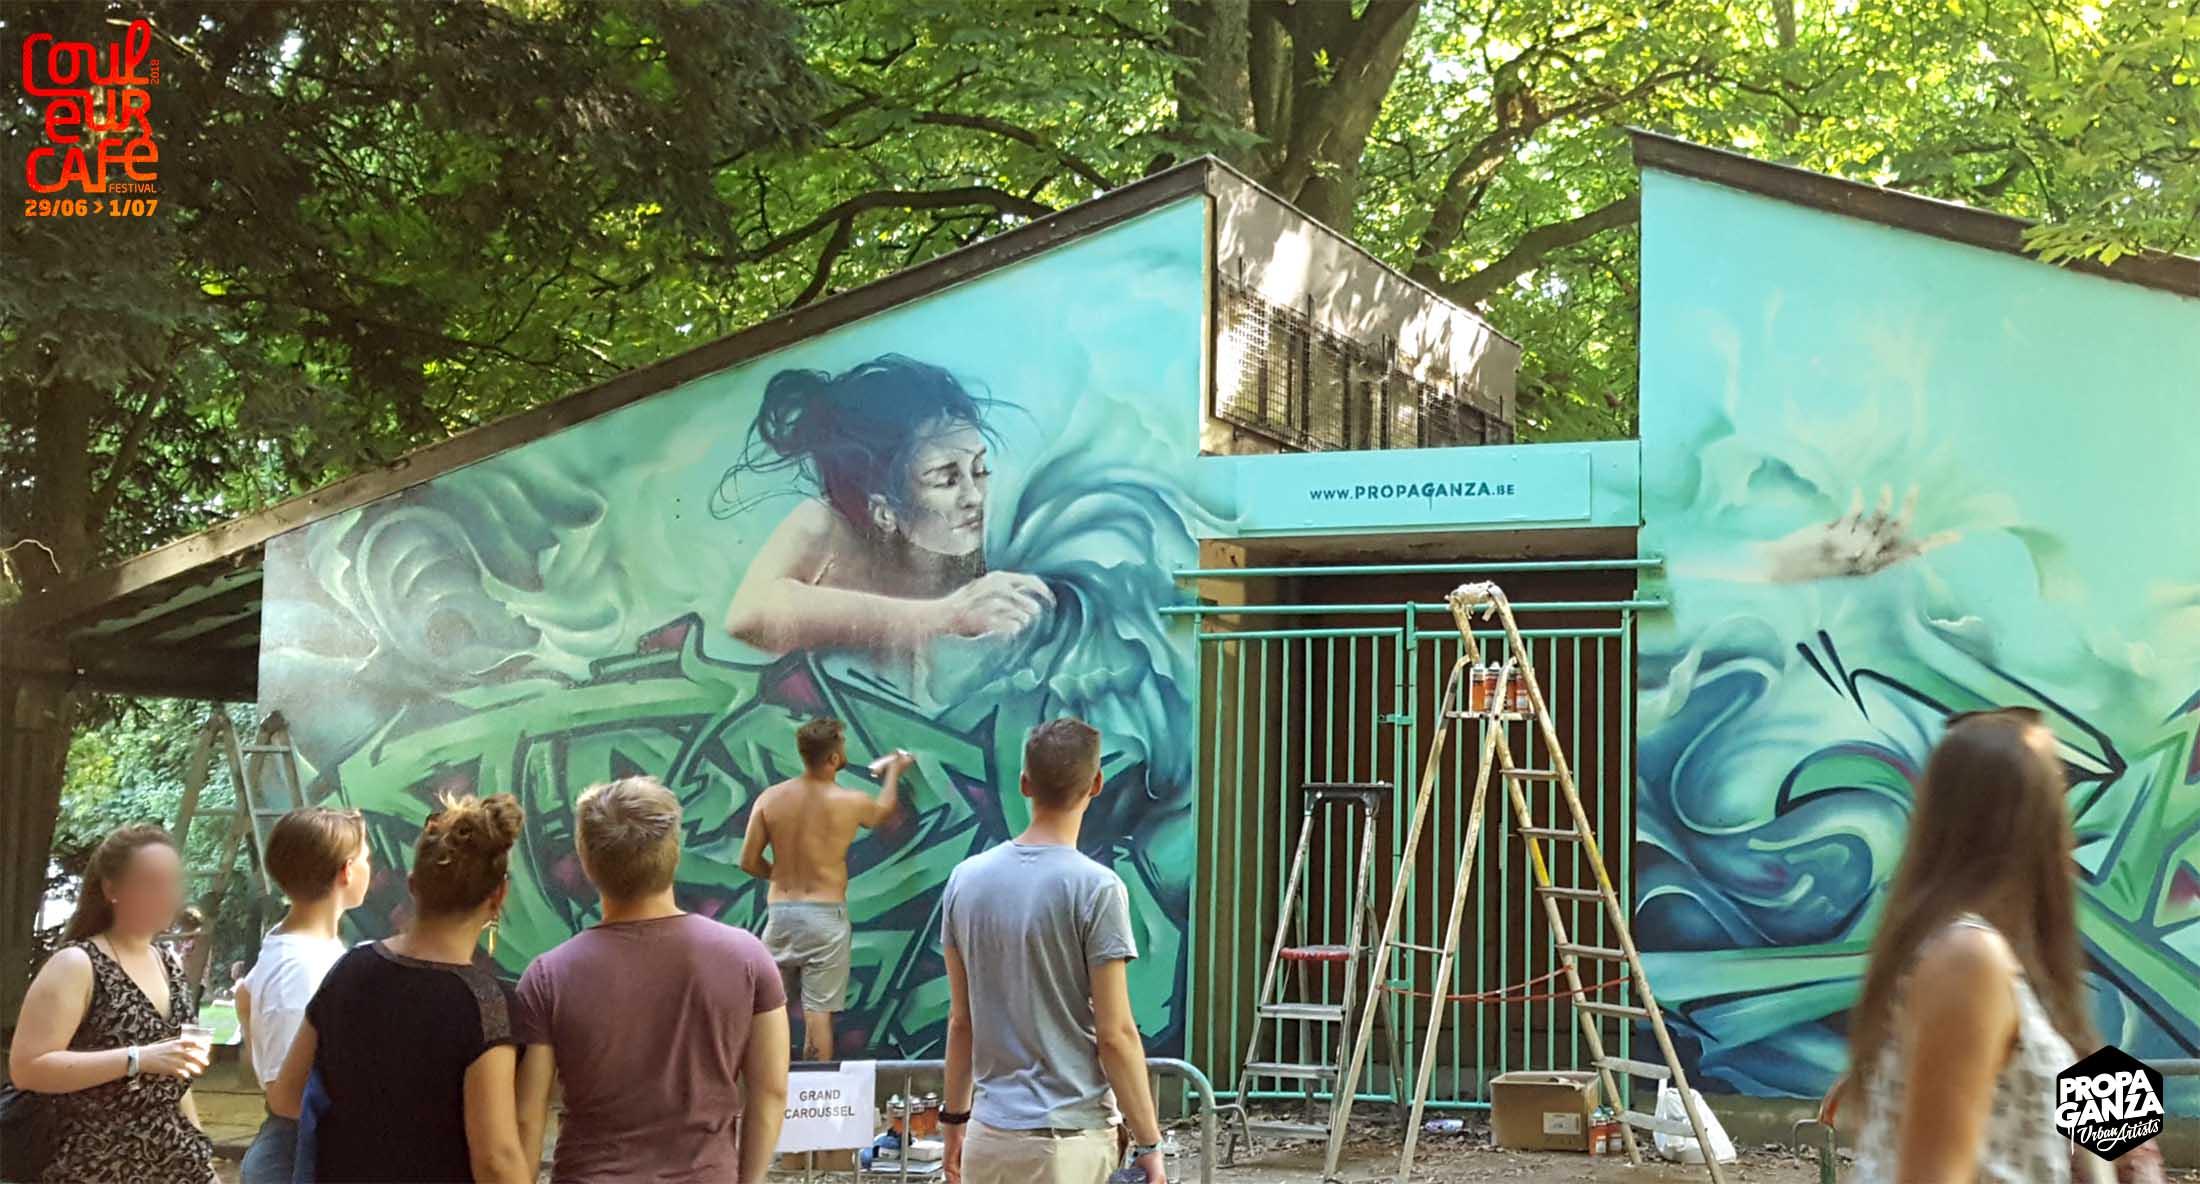 https://www.propaganza.be/wp-content/uploads/2019/04/propaganza-begium-bruxelles-couleur-cafe-artist-graffiti-street-art-spray-live-painting-trevor-orkez-iota-roubens-2018-4-1.jpg